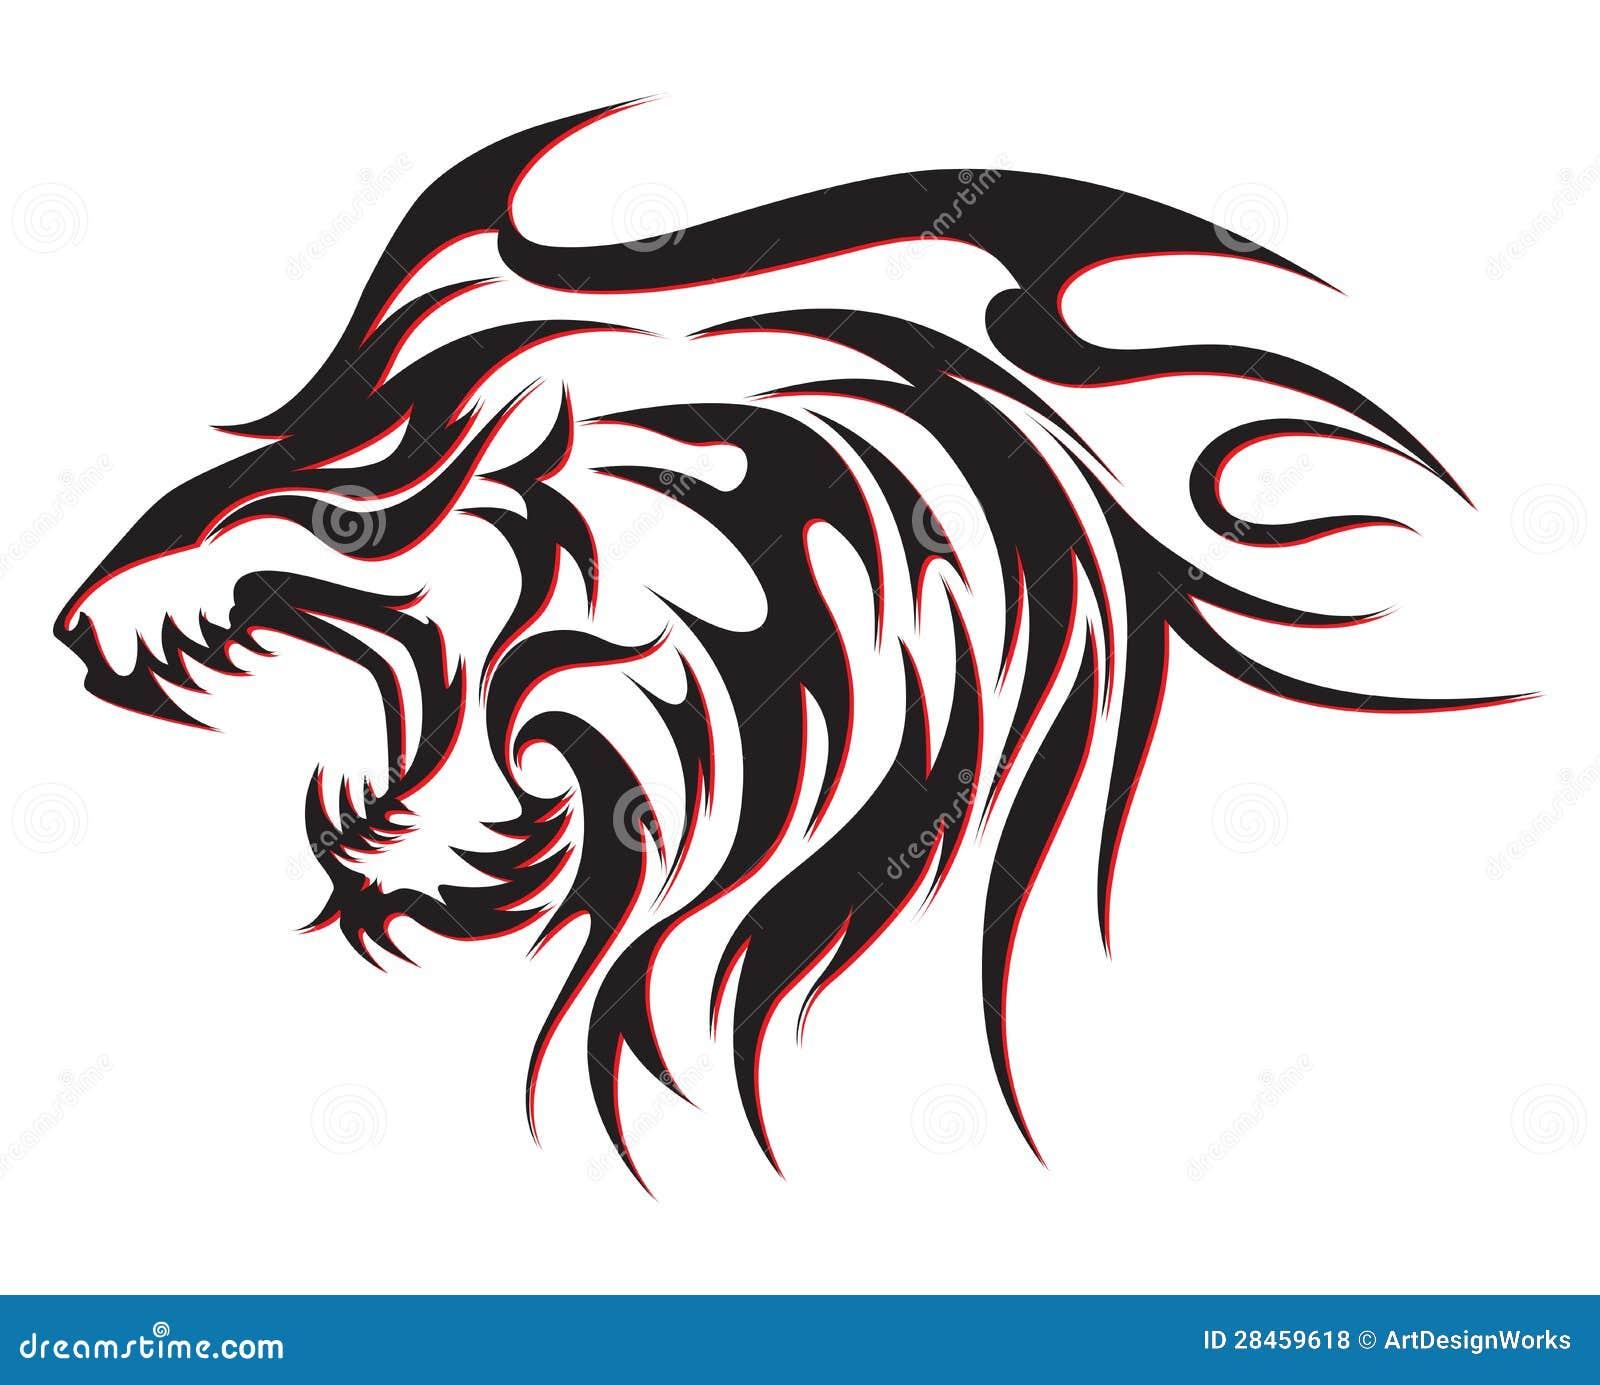 Татуировка Tribalwolf